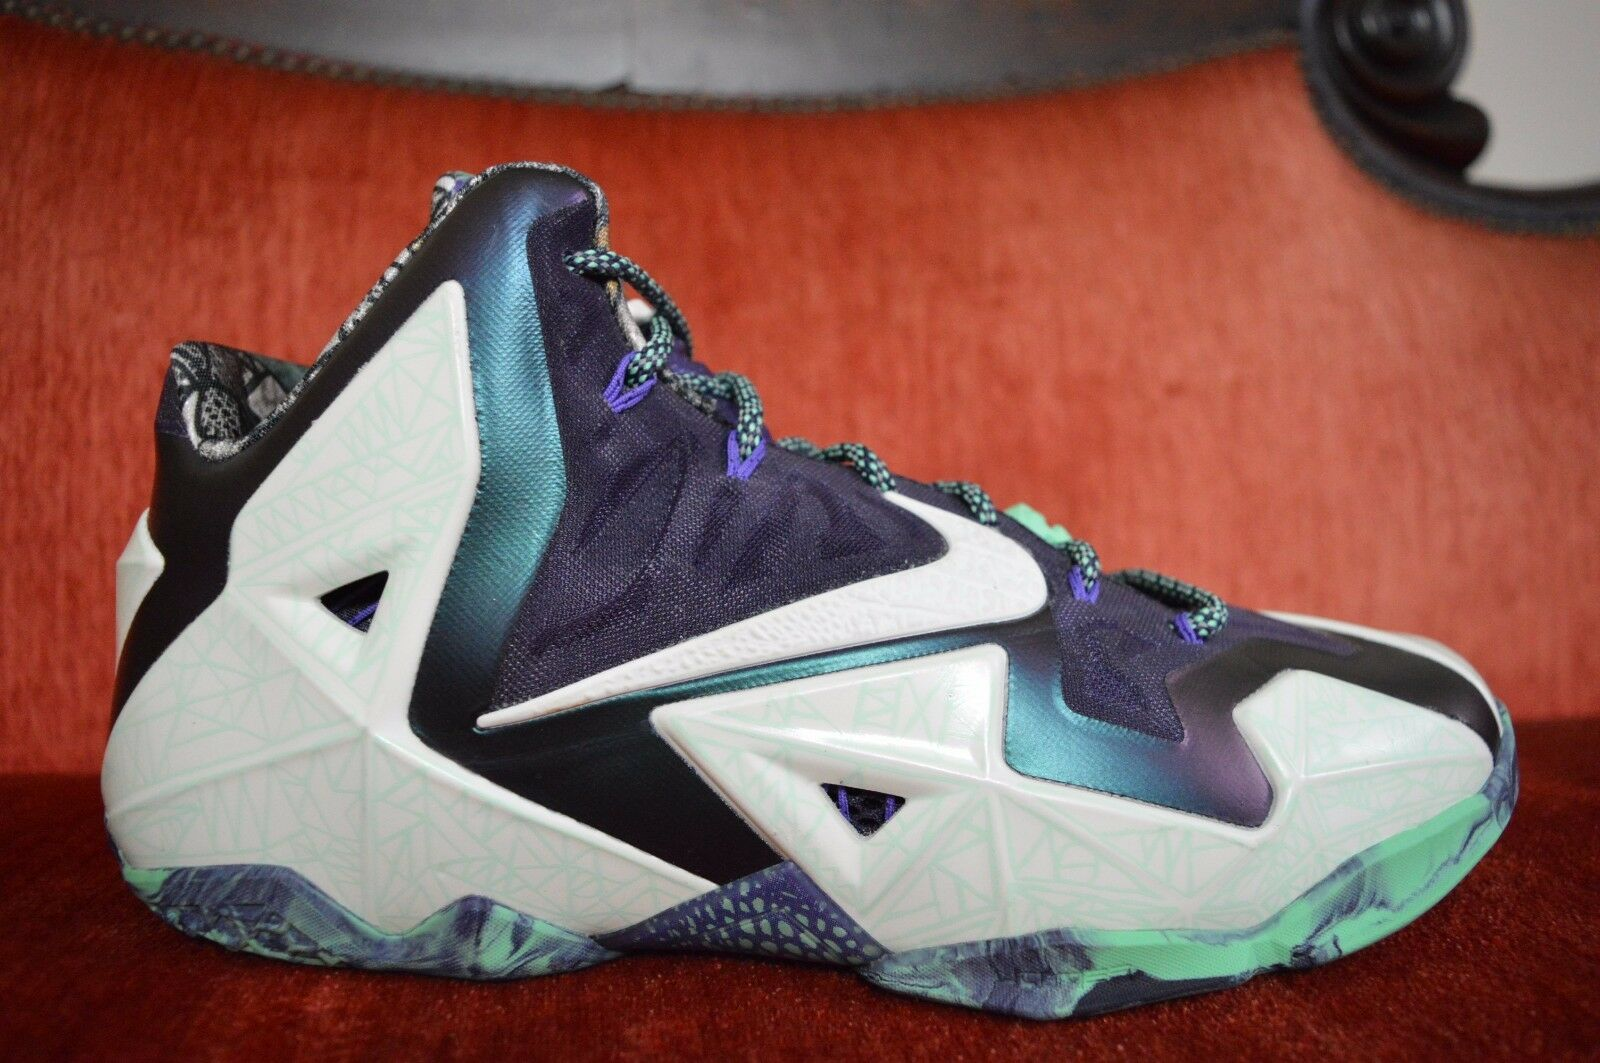 WORN NOLA ONCE Nike Lebron 11 NOLA WORN ASG GUMBO LEAGUE size 11.5 Gator King All Star 14511d